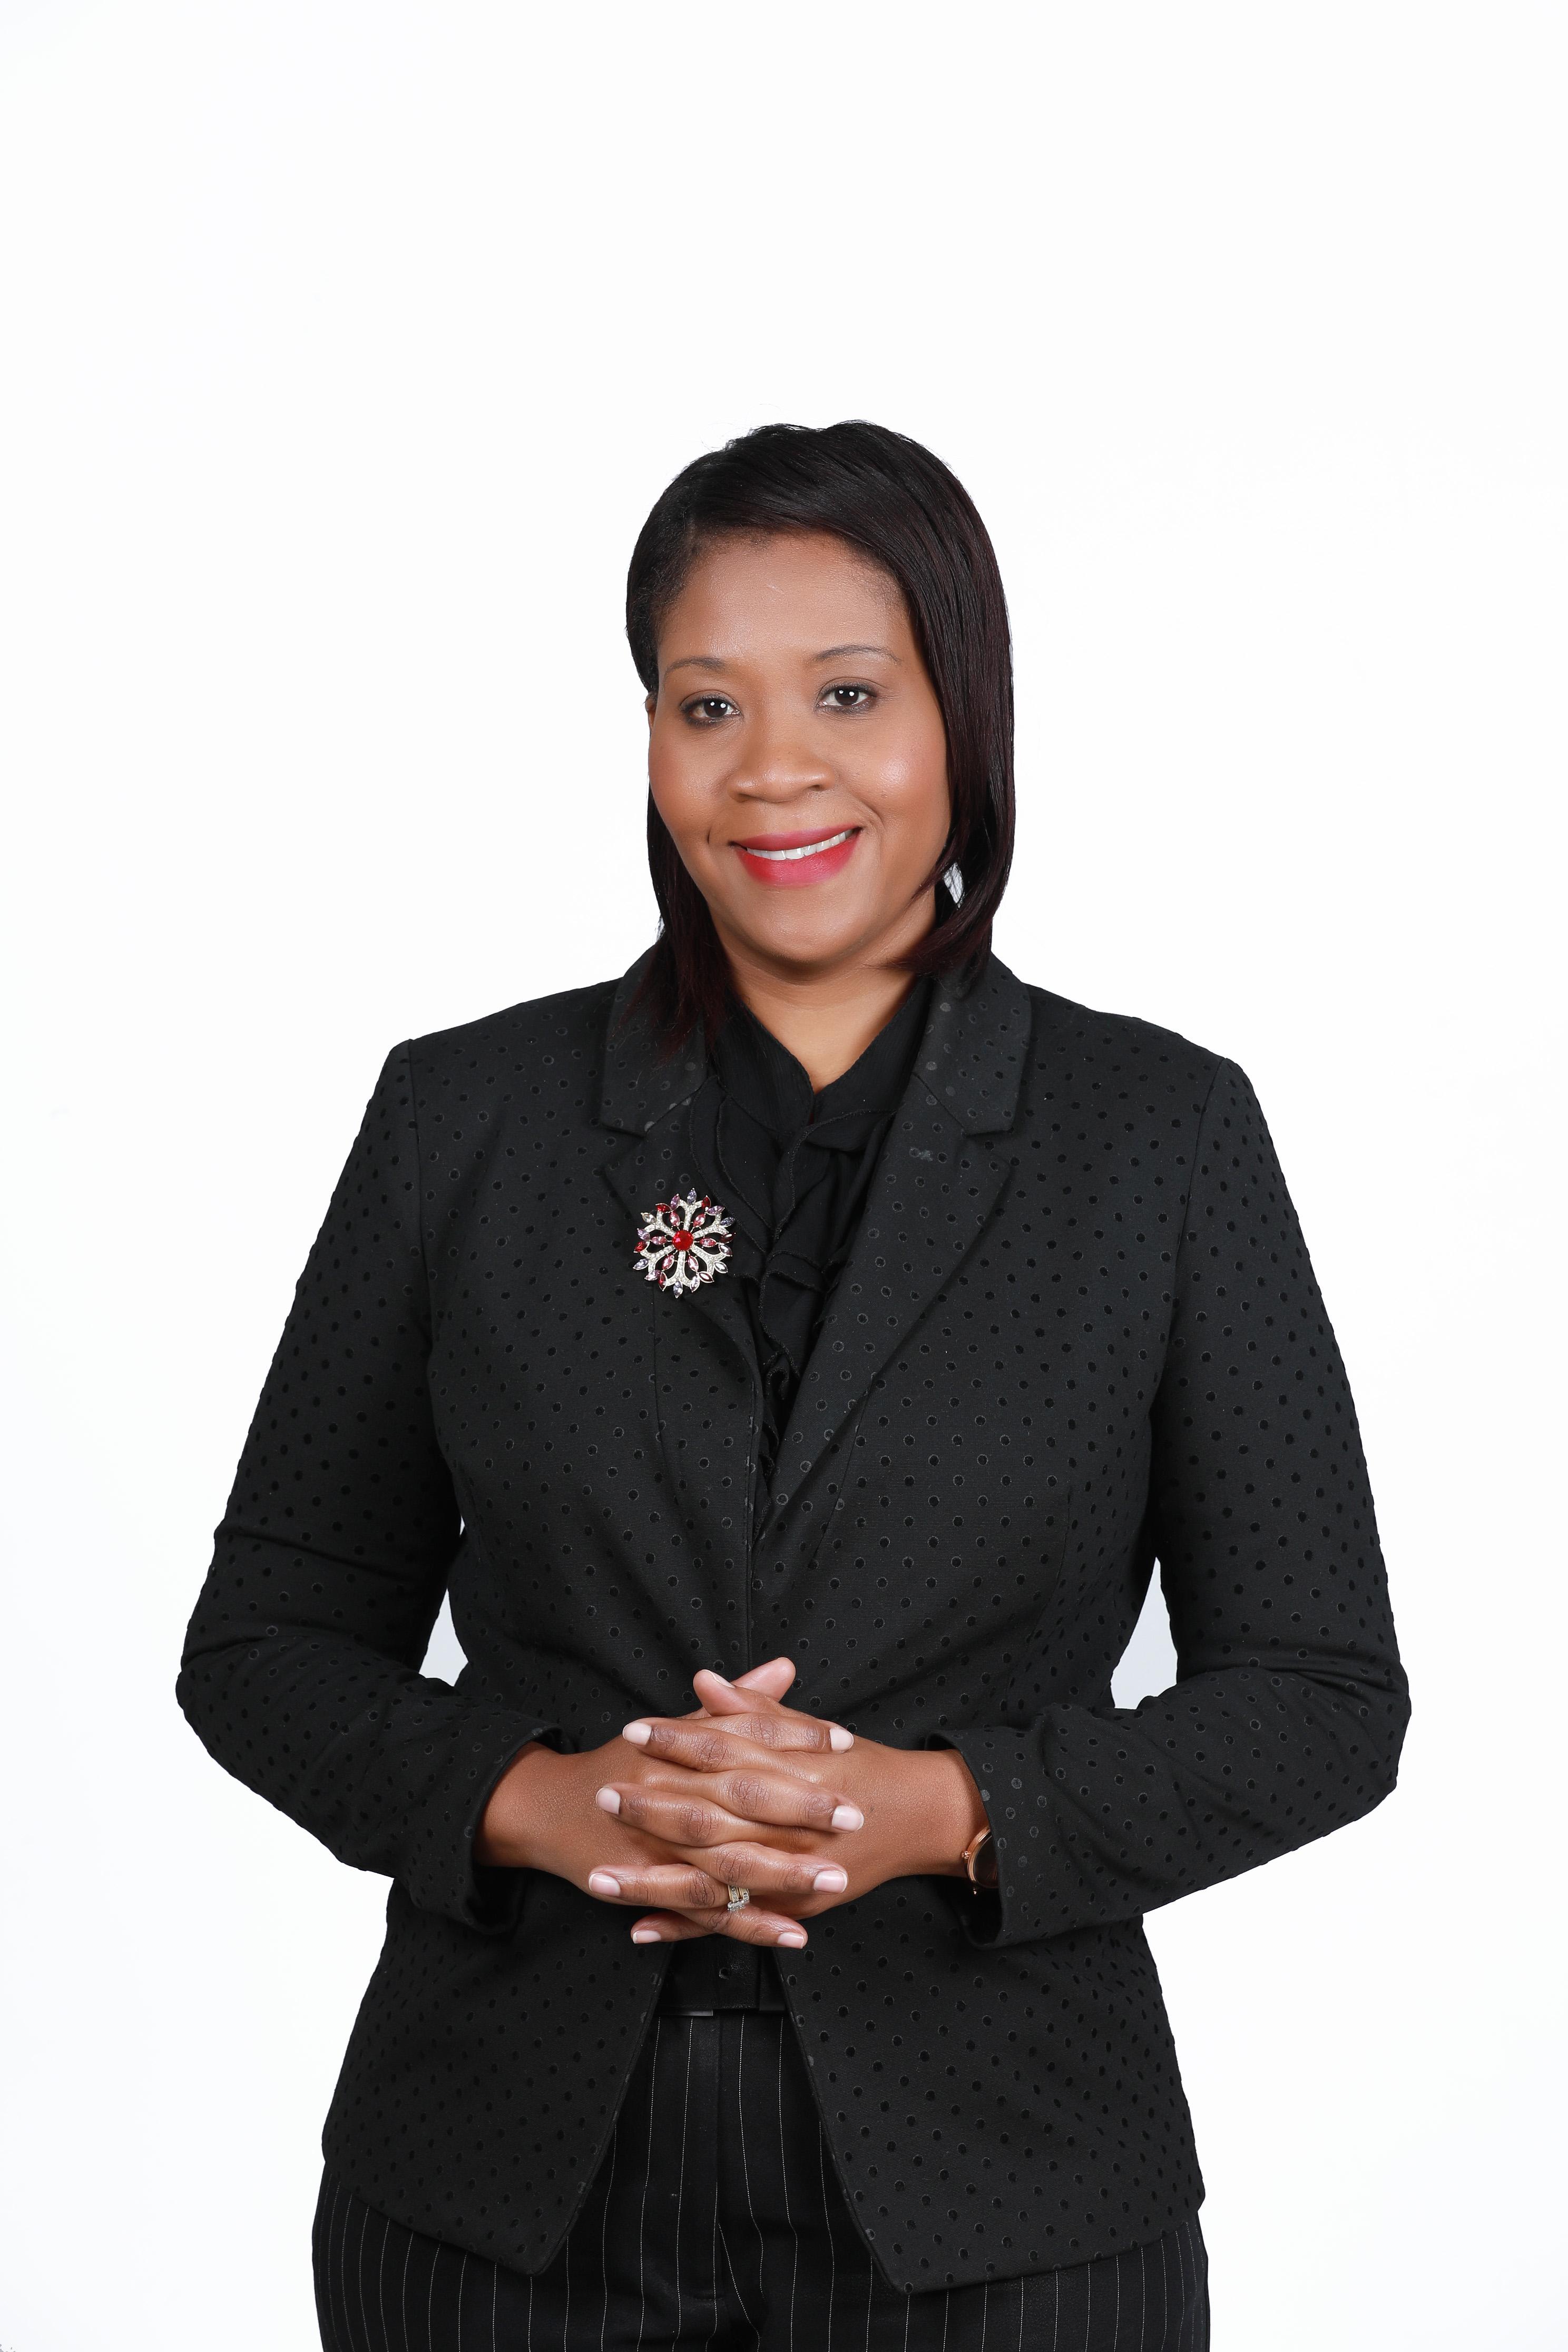 Alicia Aiken Goss, PR Liaison